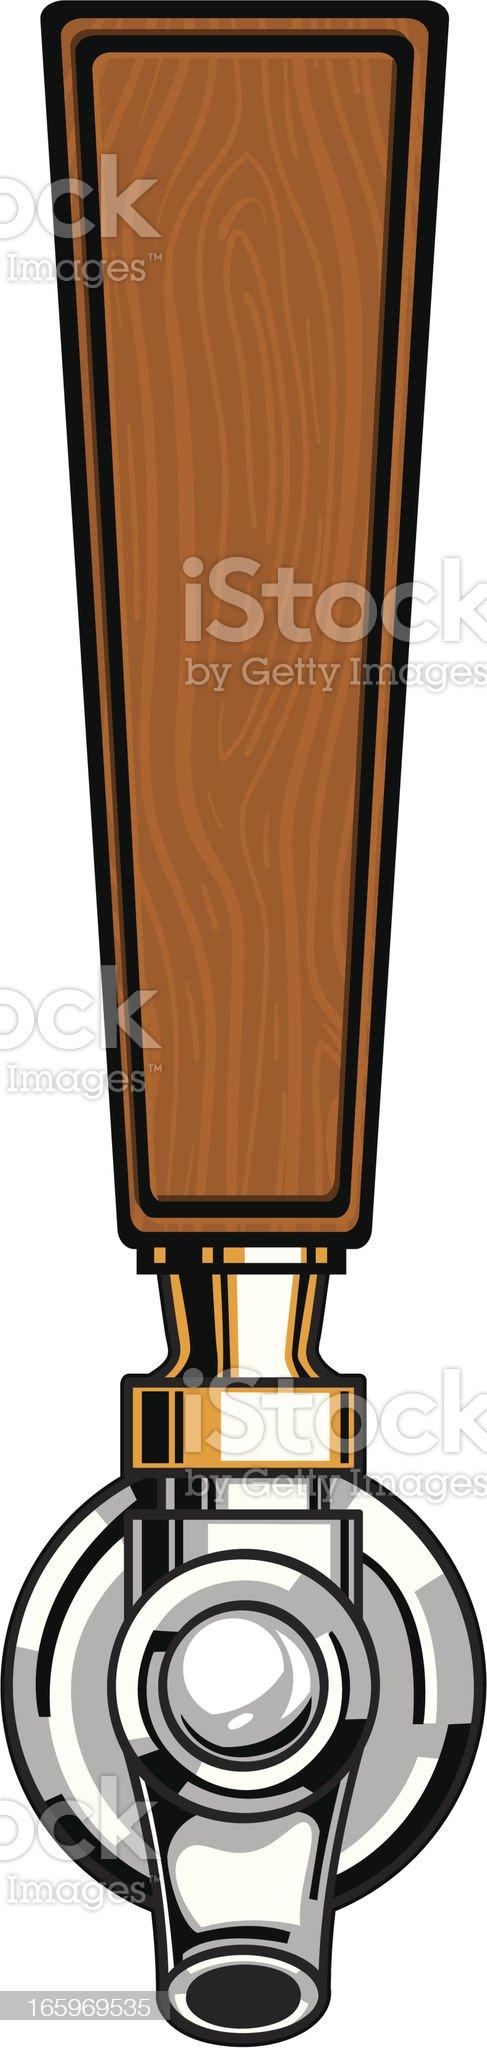 wood beer tap royalty-free stock vector art